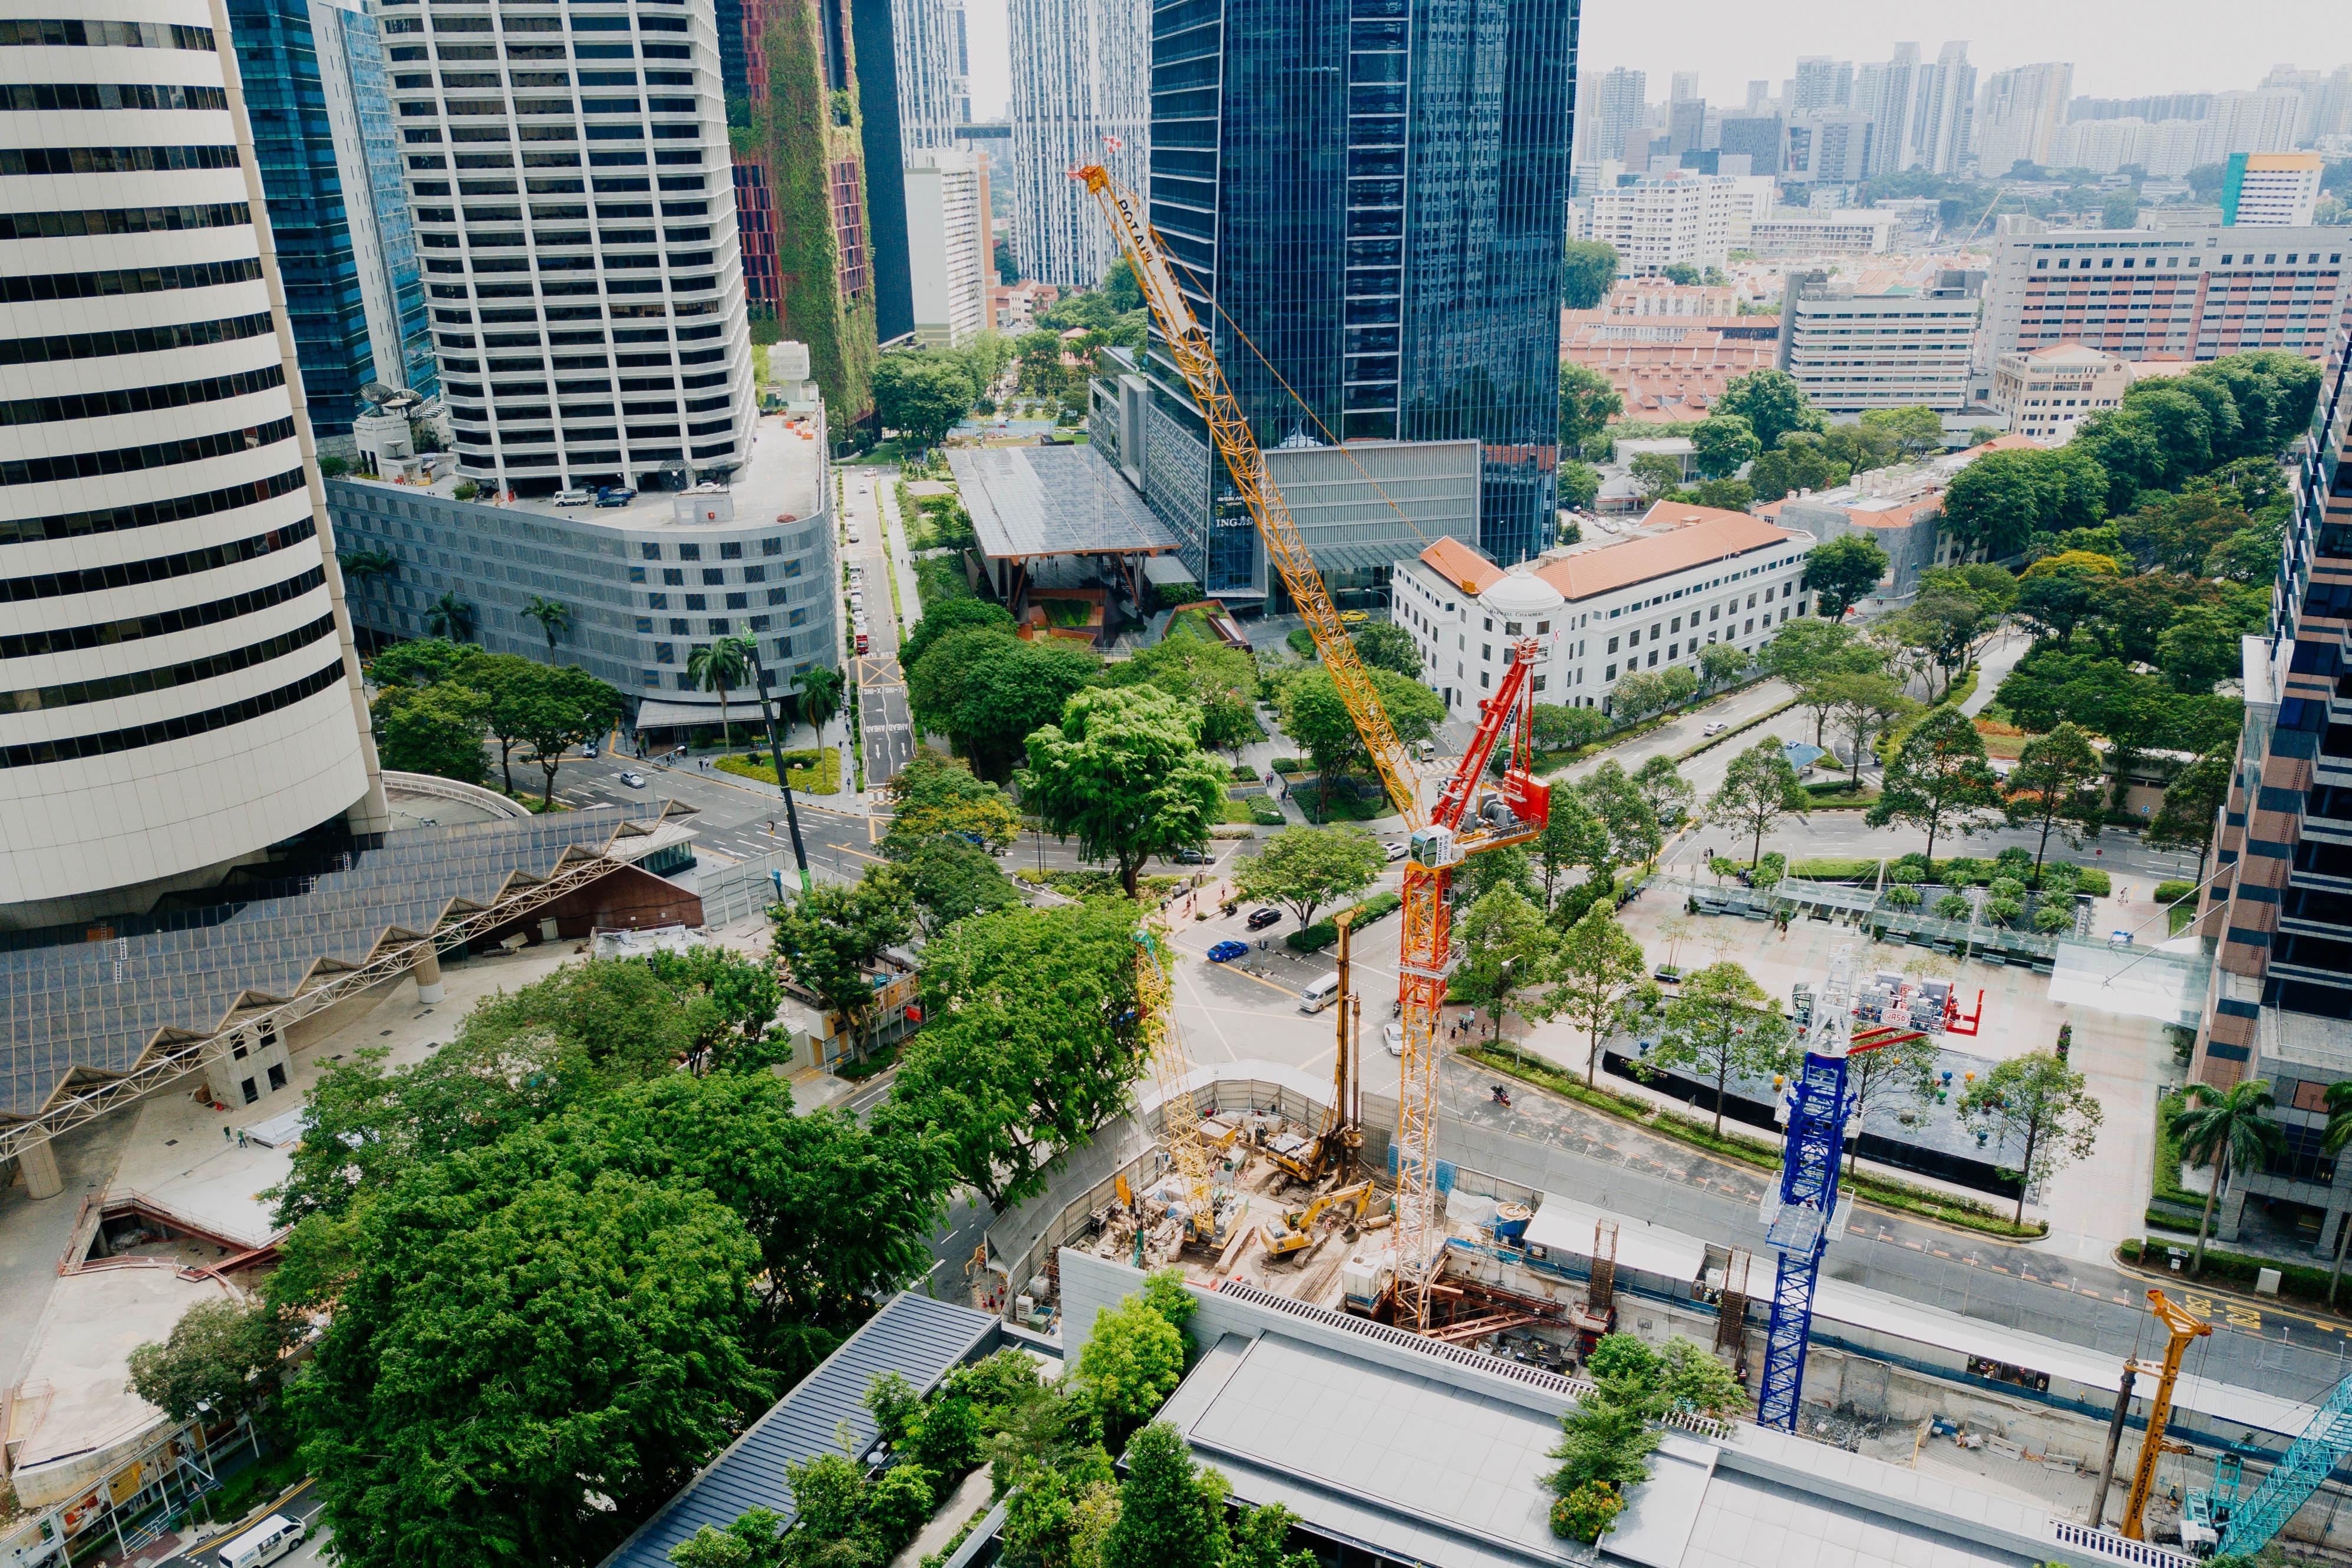 crane beside city buildings